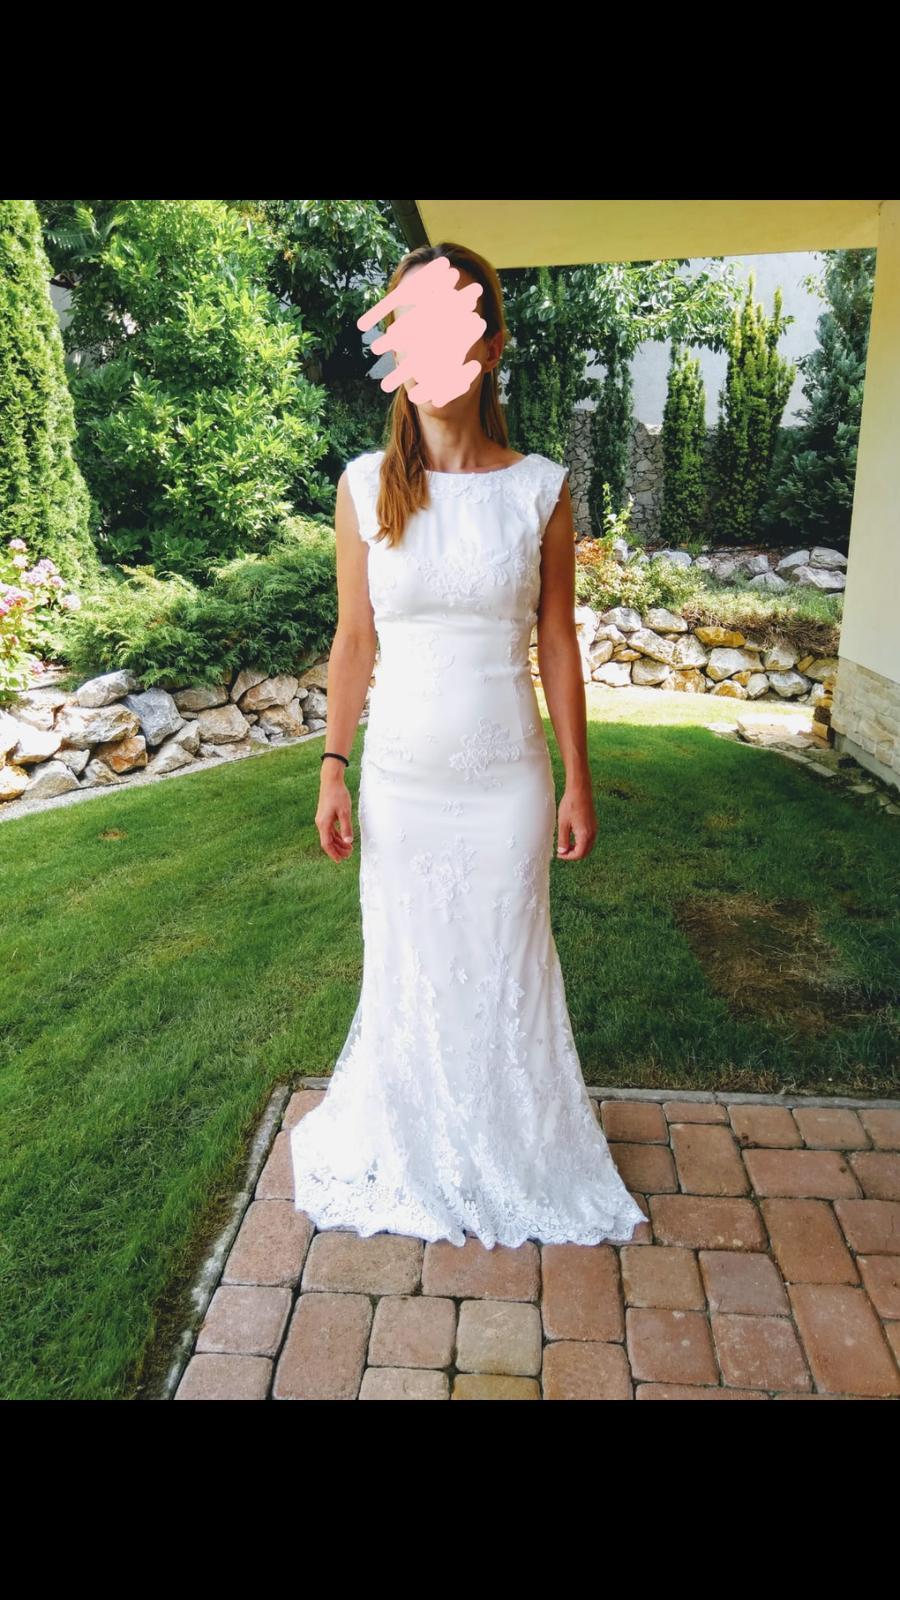 Svadobné šaty s jemnou čipkou a miernou vlečkou - Obrázok č. 3